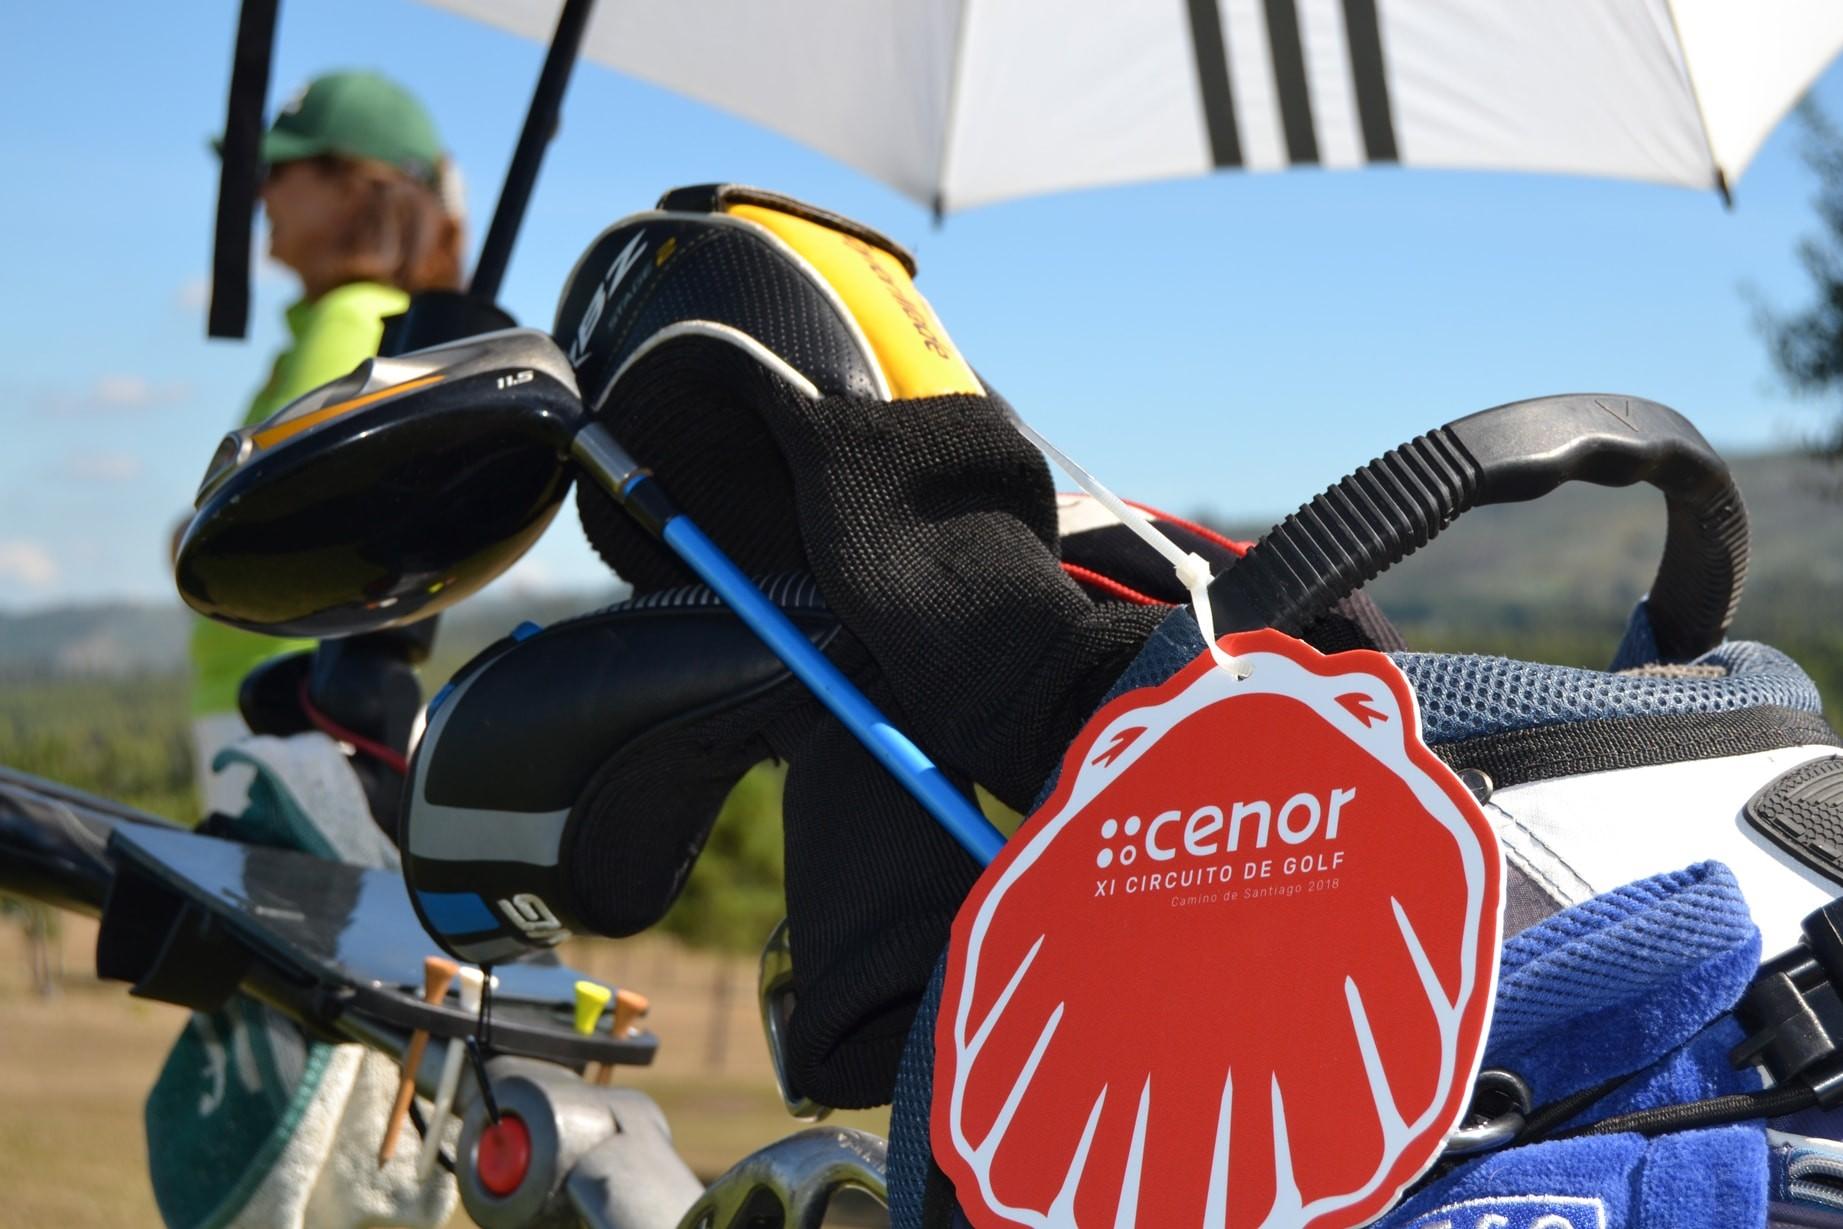 Final-Golf-Cenor-2018.jpg